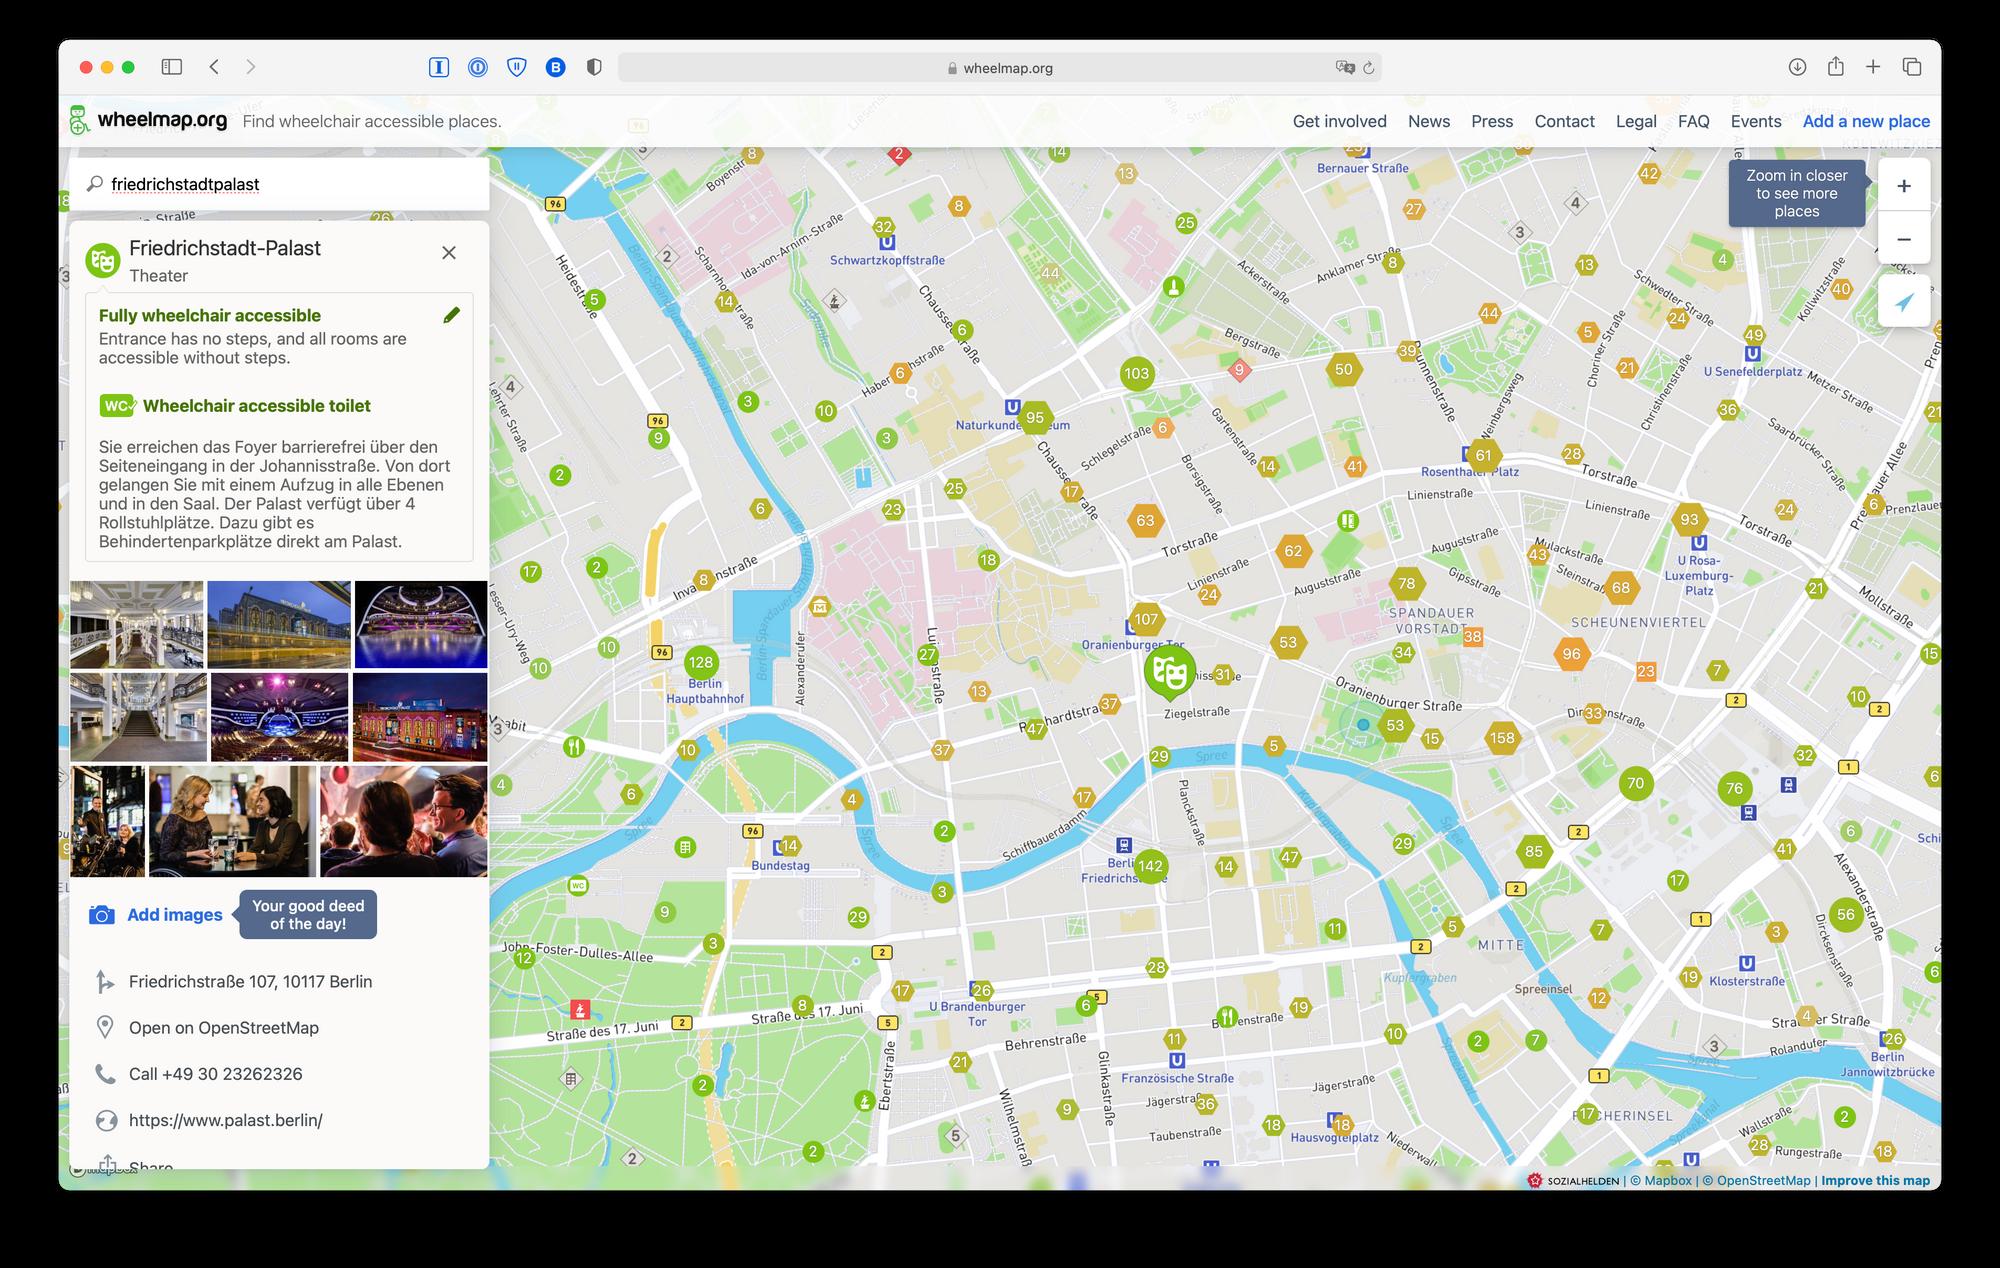 Wheelmap.org on a desktop browser, showing details about a a varieté theater in Berlin.